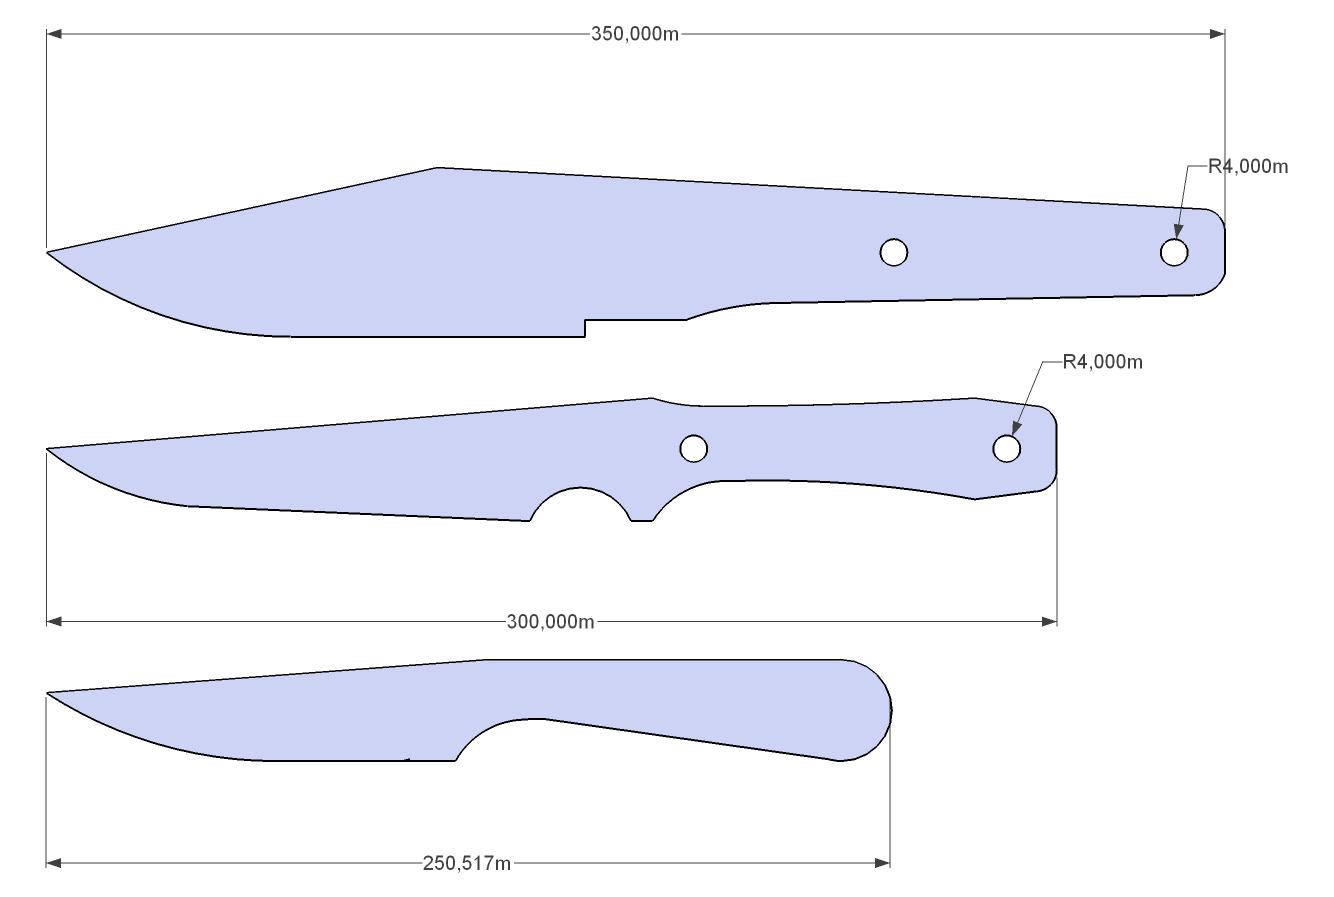 Knife Drawings Knife Template Knife Patterns Knife